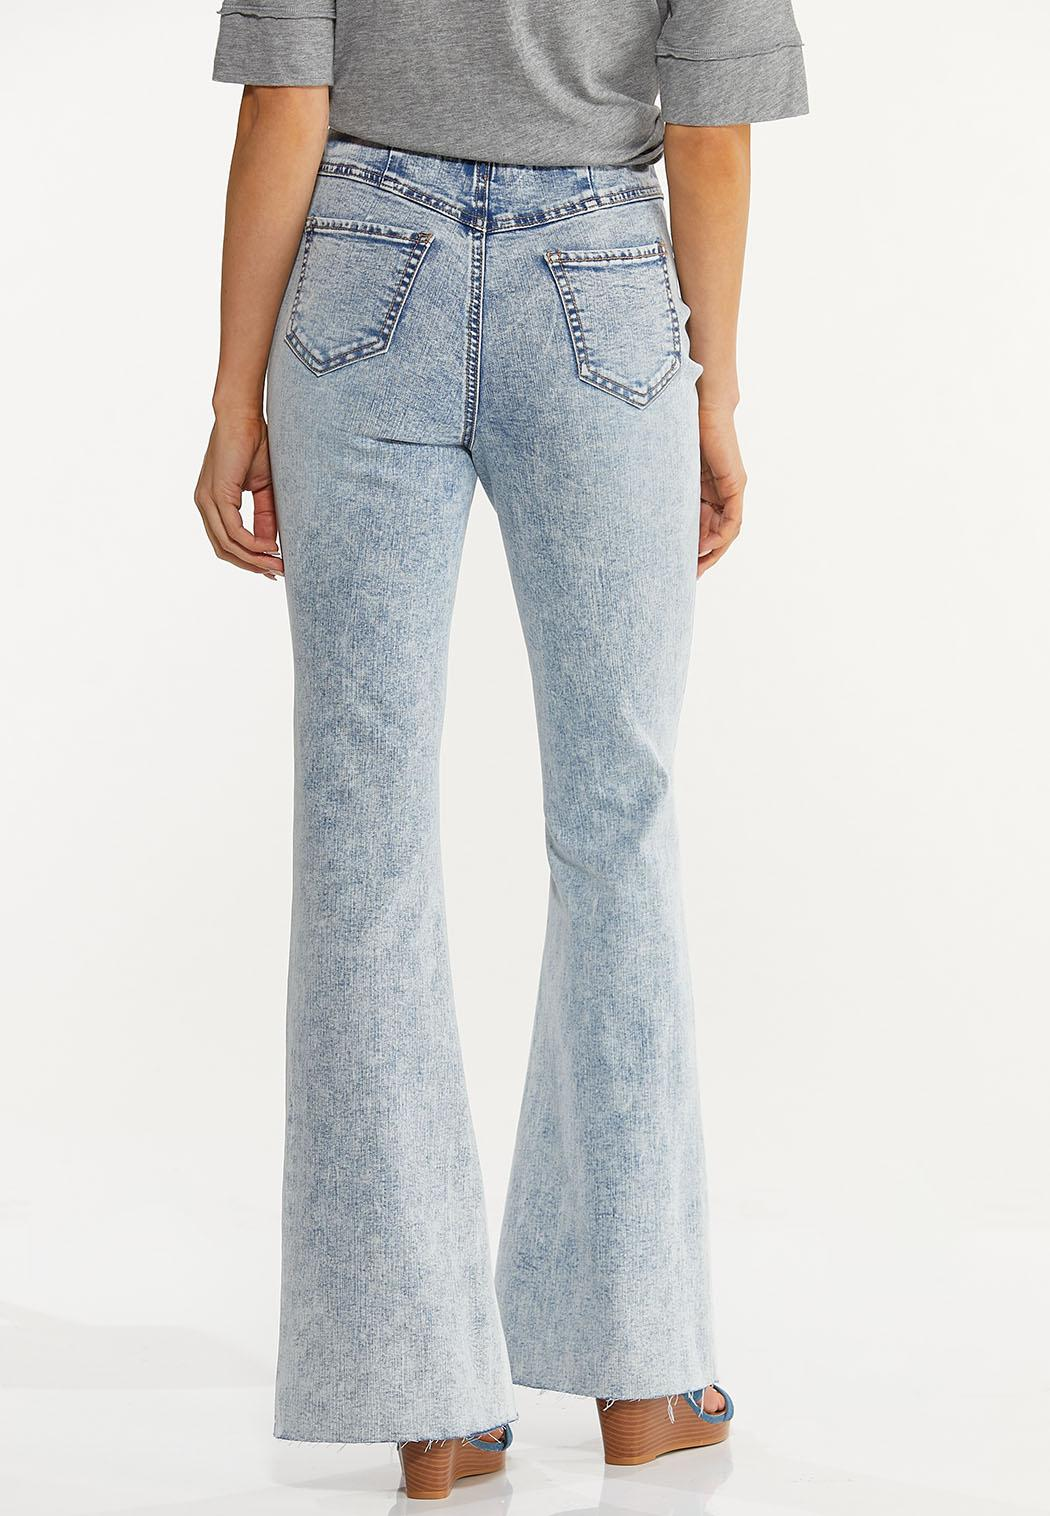 Acid Wash High Rise Jeans (Item #44571716)